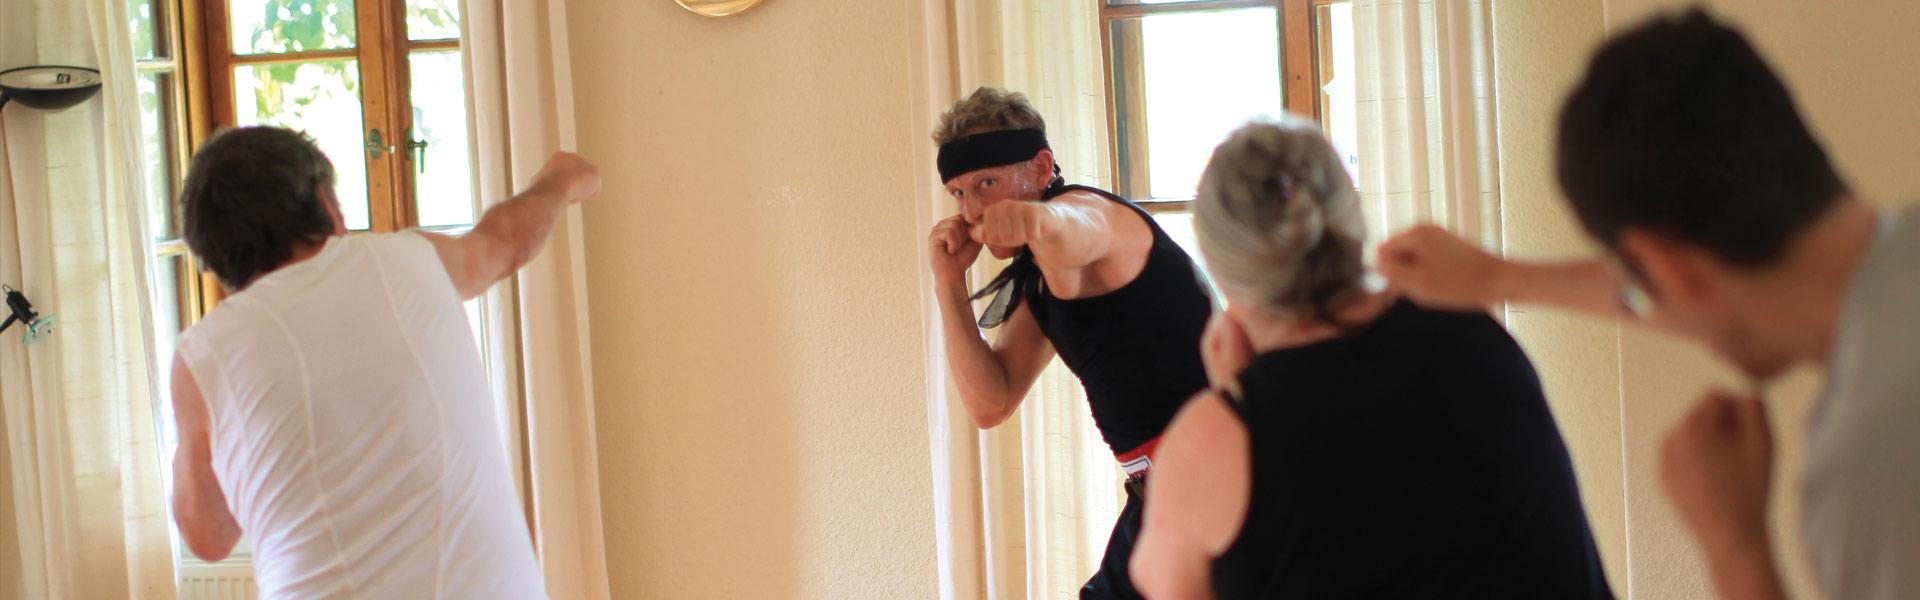 Fortbildung Energy Dance